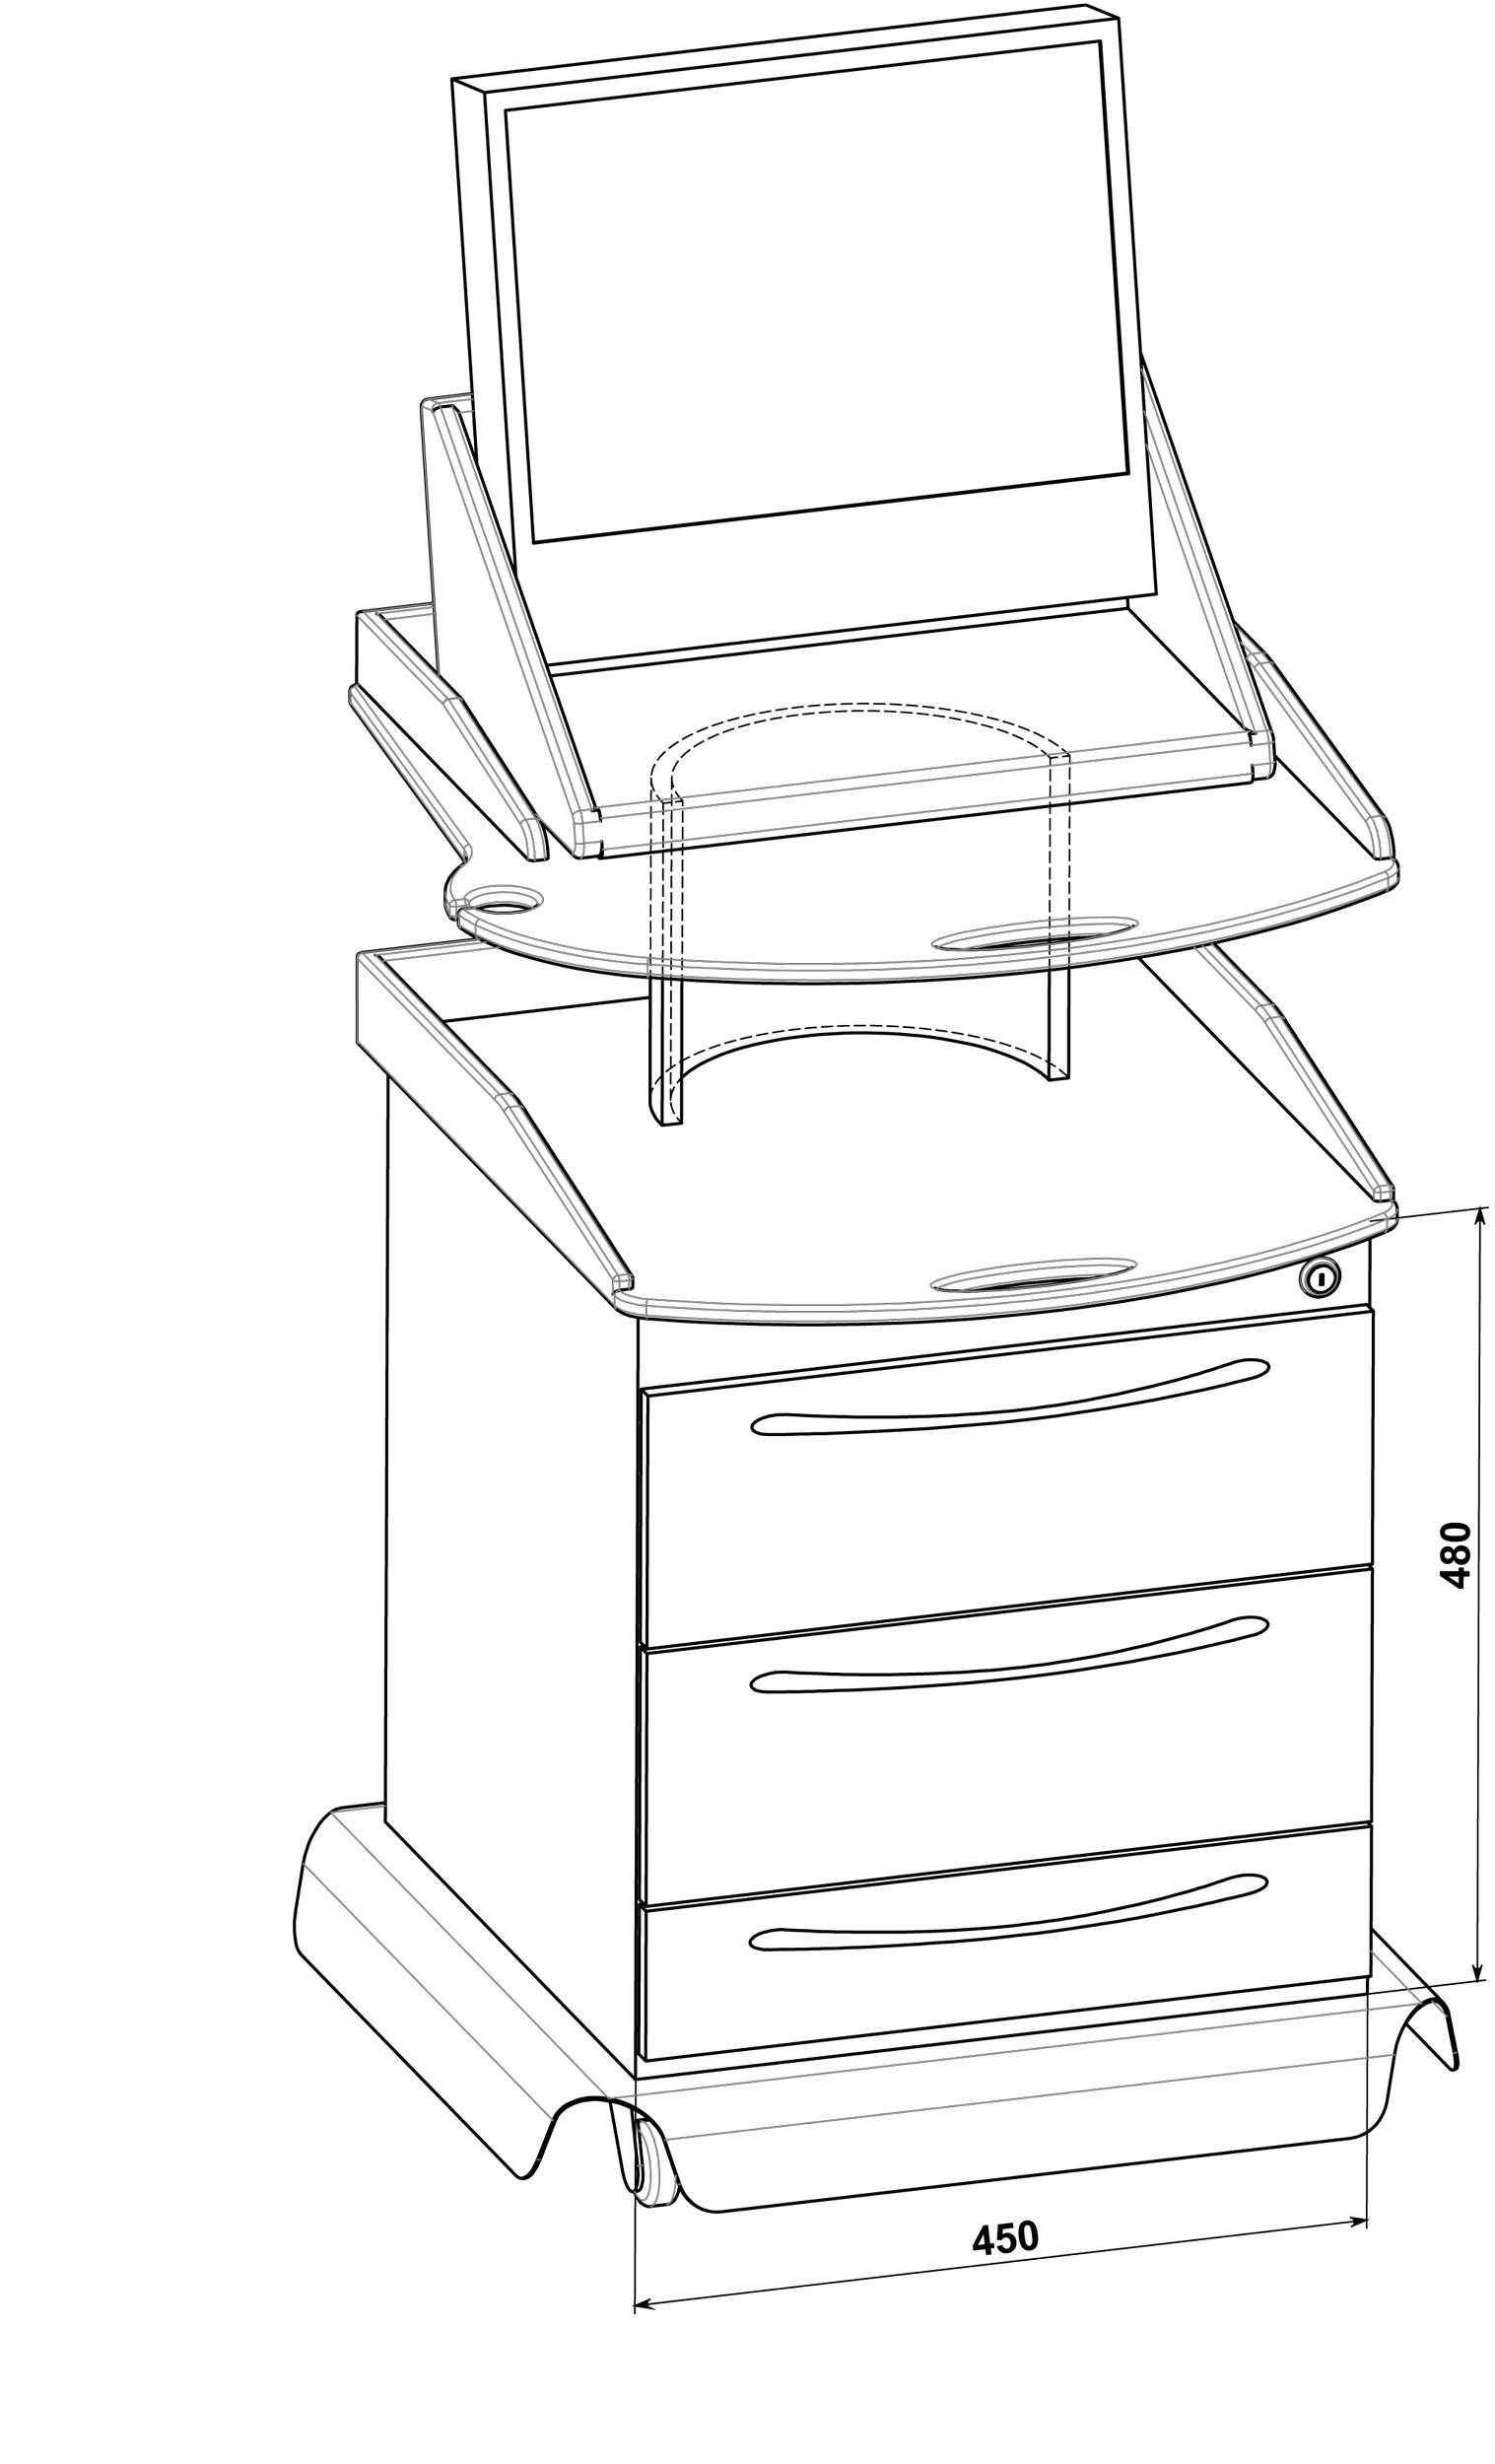 столик для вибромассажера